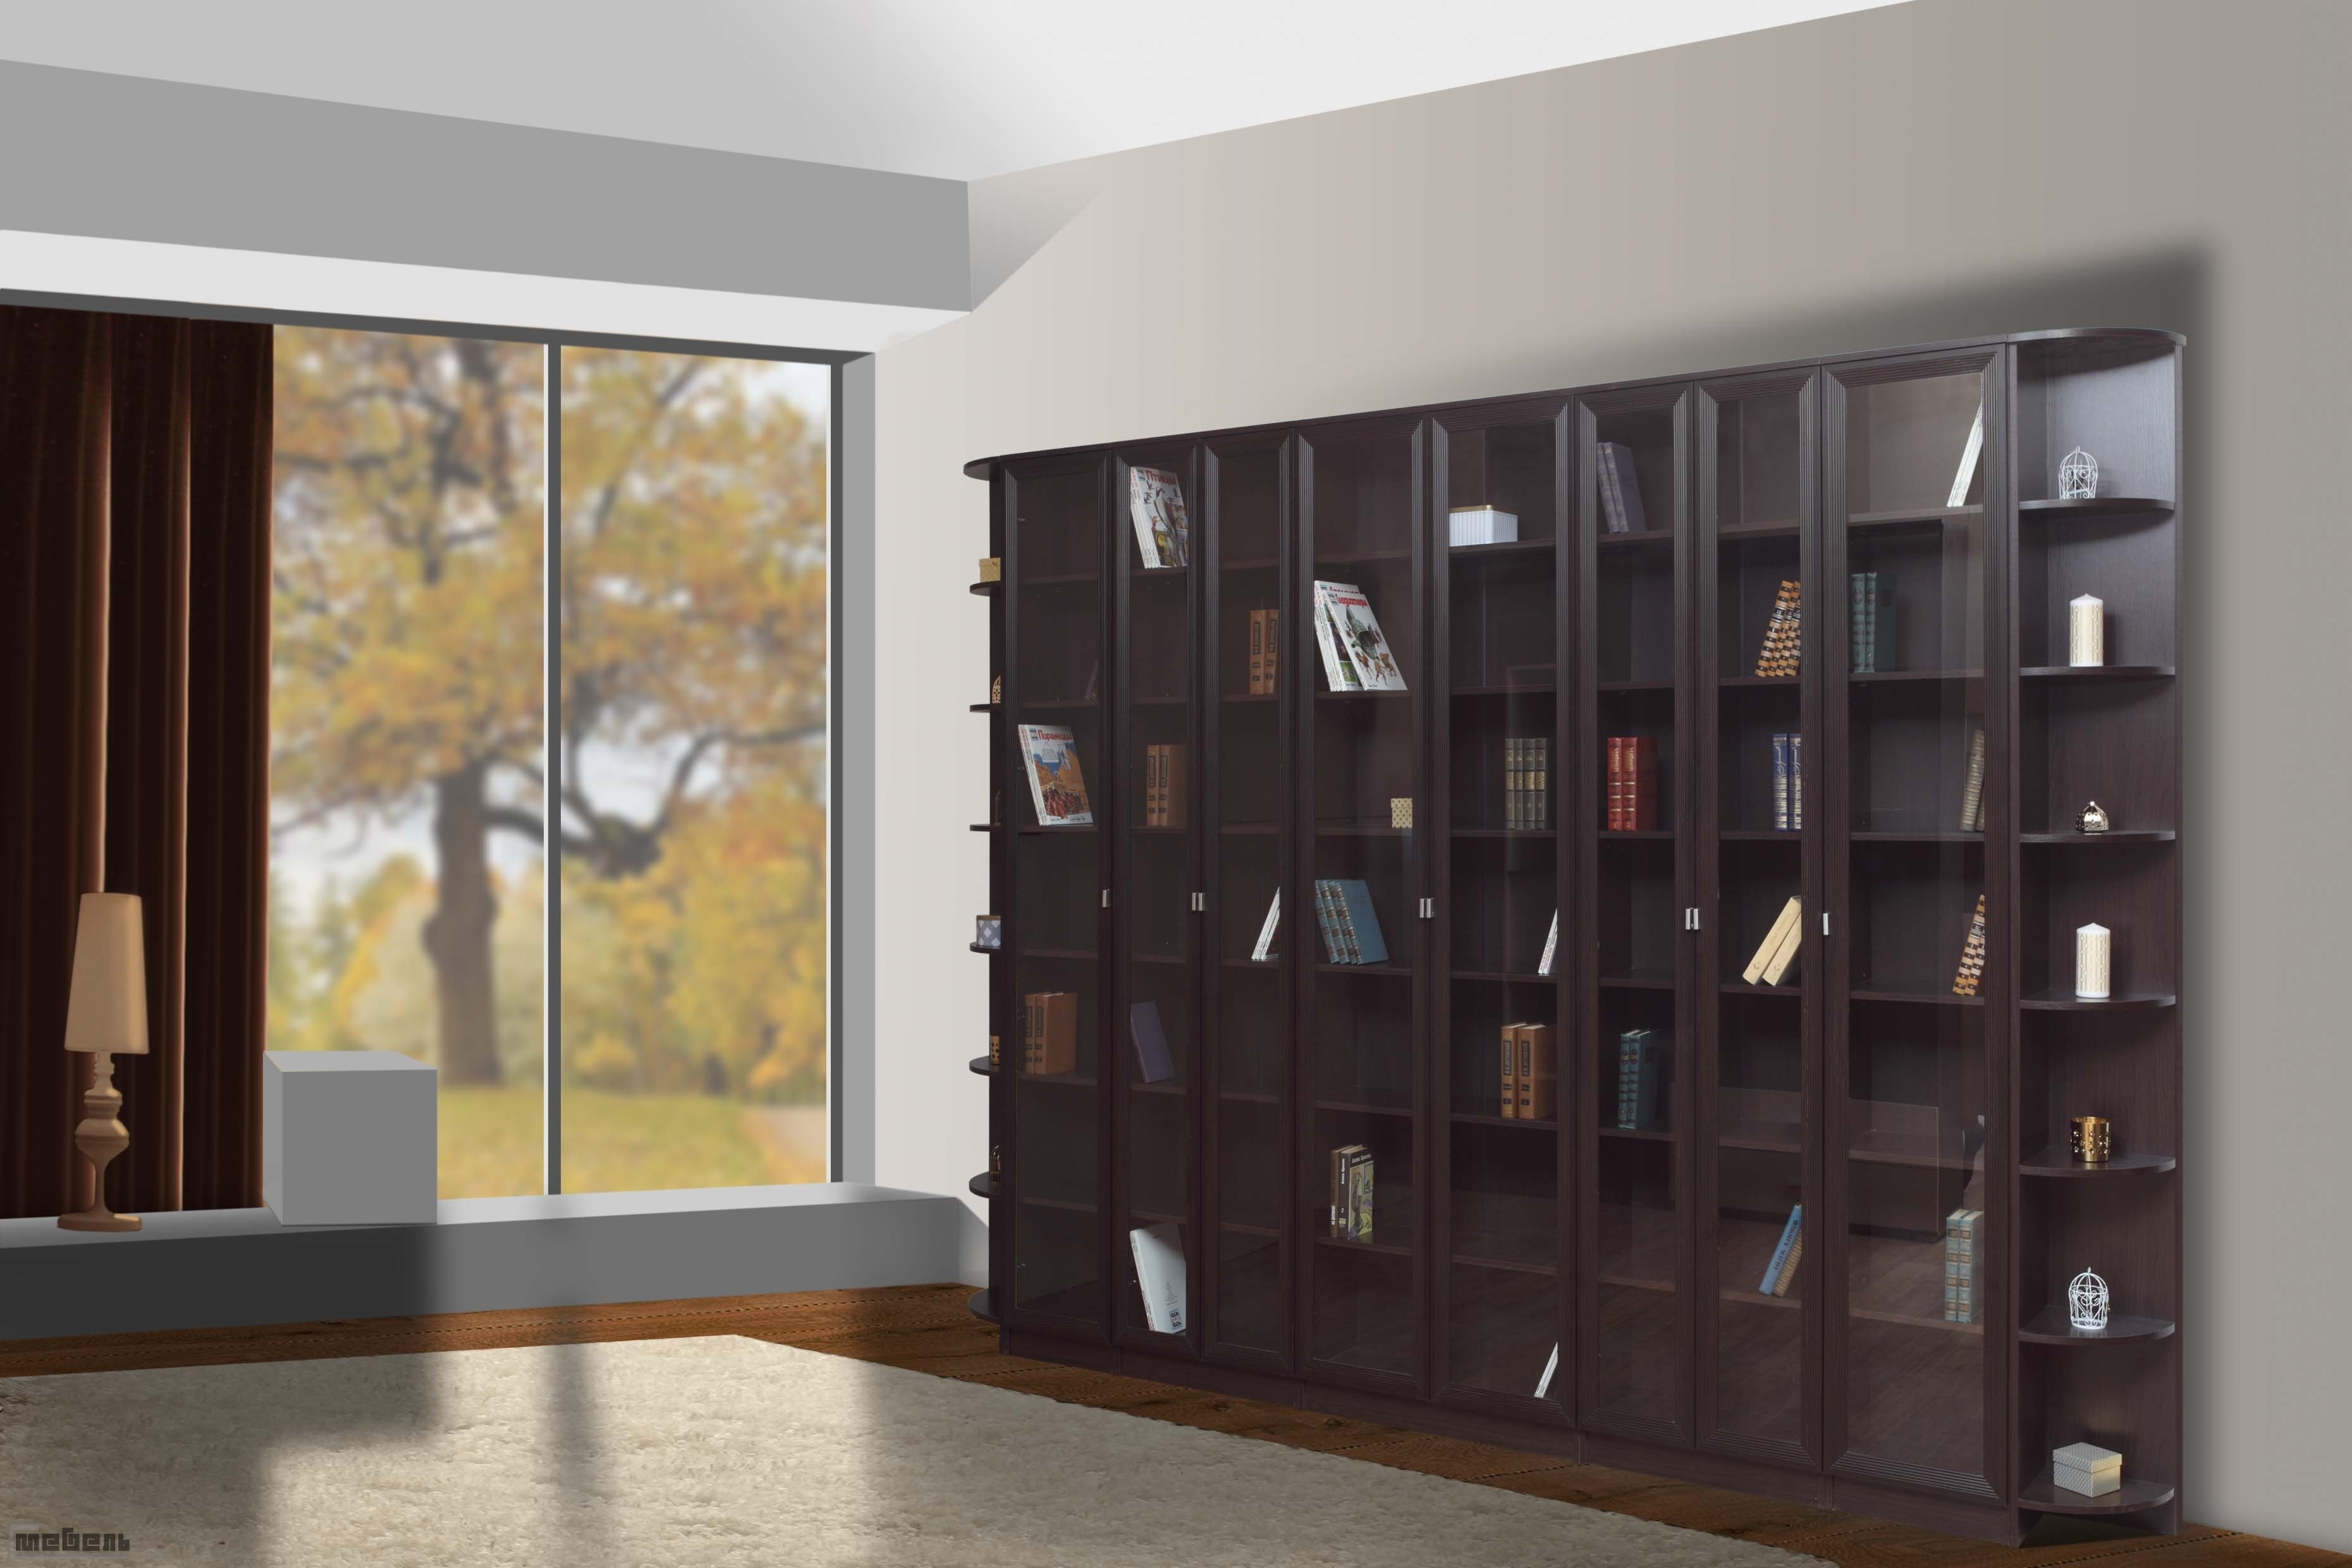 Библиотека олимп :: интернет-магазин территориЯ мебели.